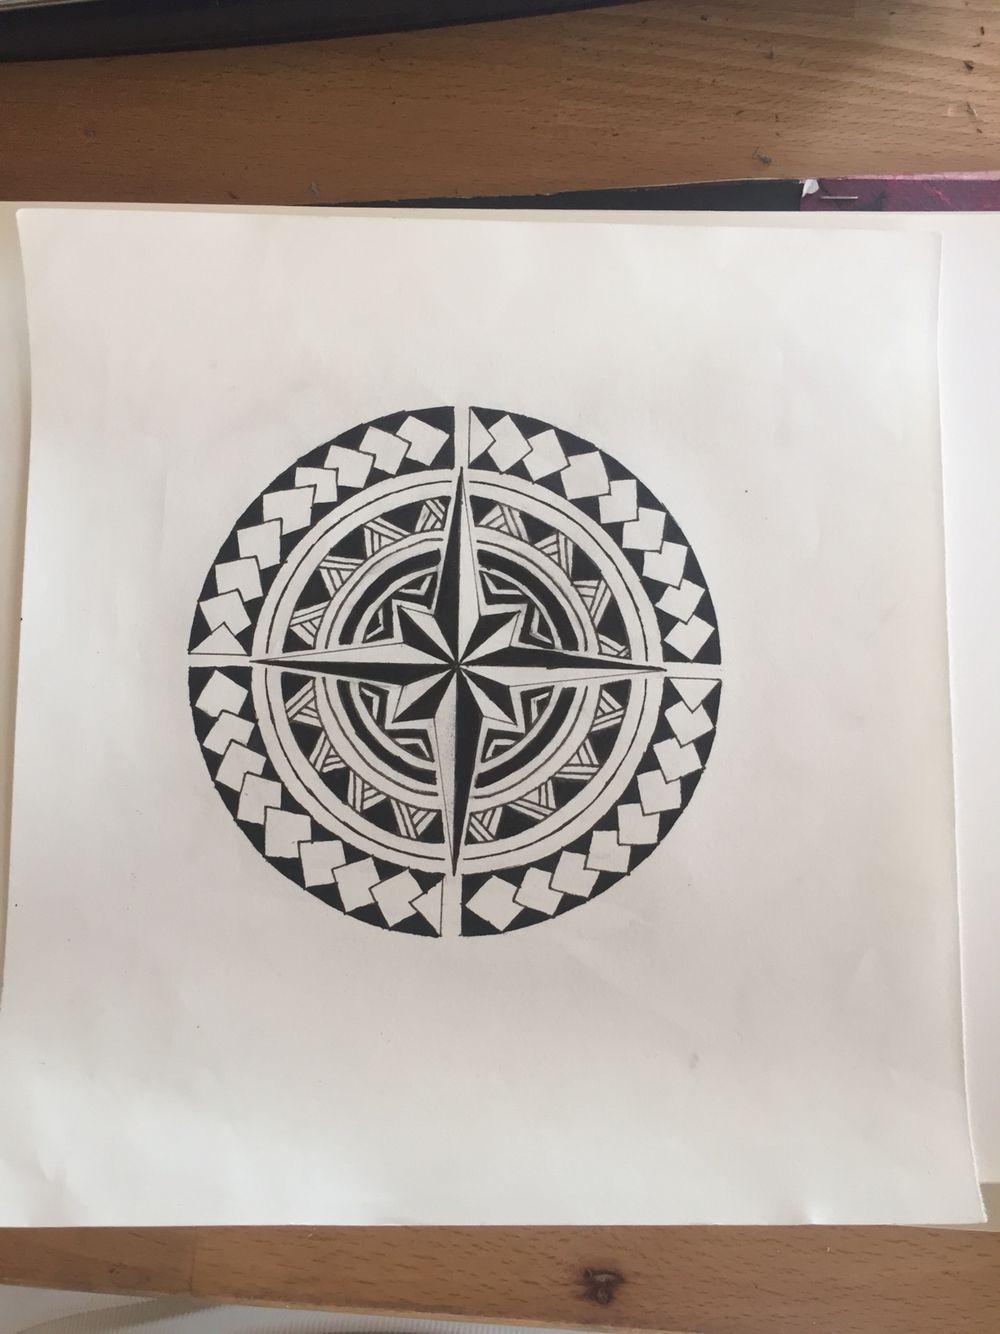 Rose des vents maori mandala jewelry design ideas pinterest tatouages polyn siens - Tatouage rose des vent ...